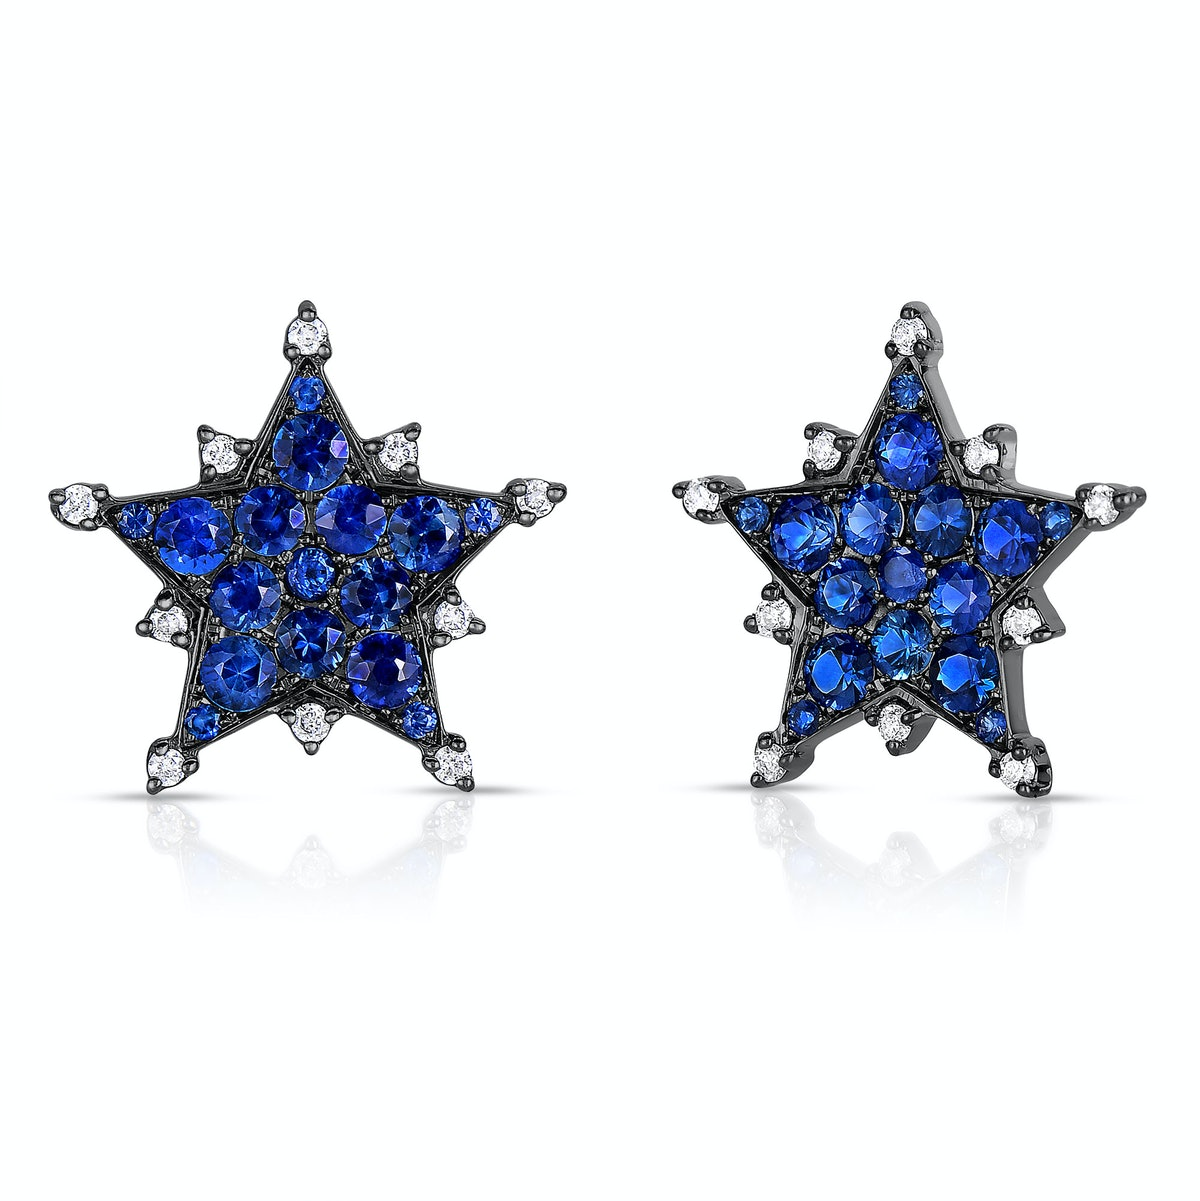 Nam Cho 18K white gold, black rhodium, blue sapphire, and diamond earrings,